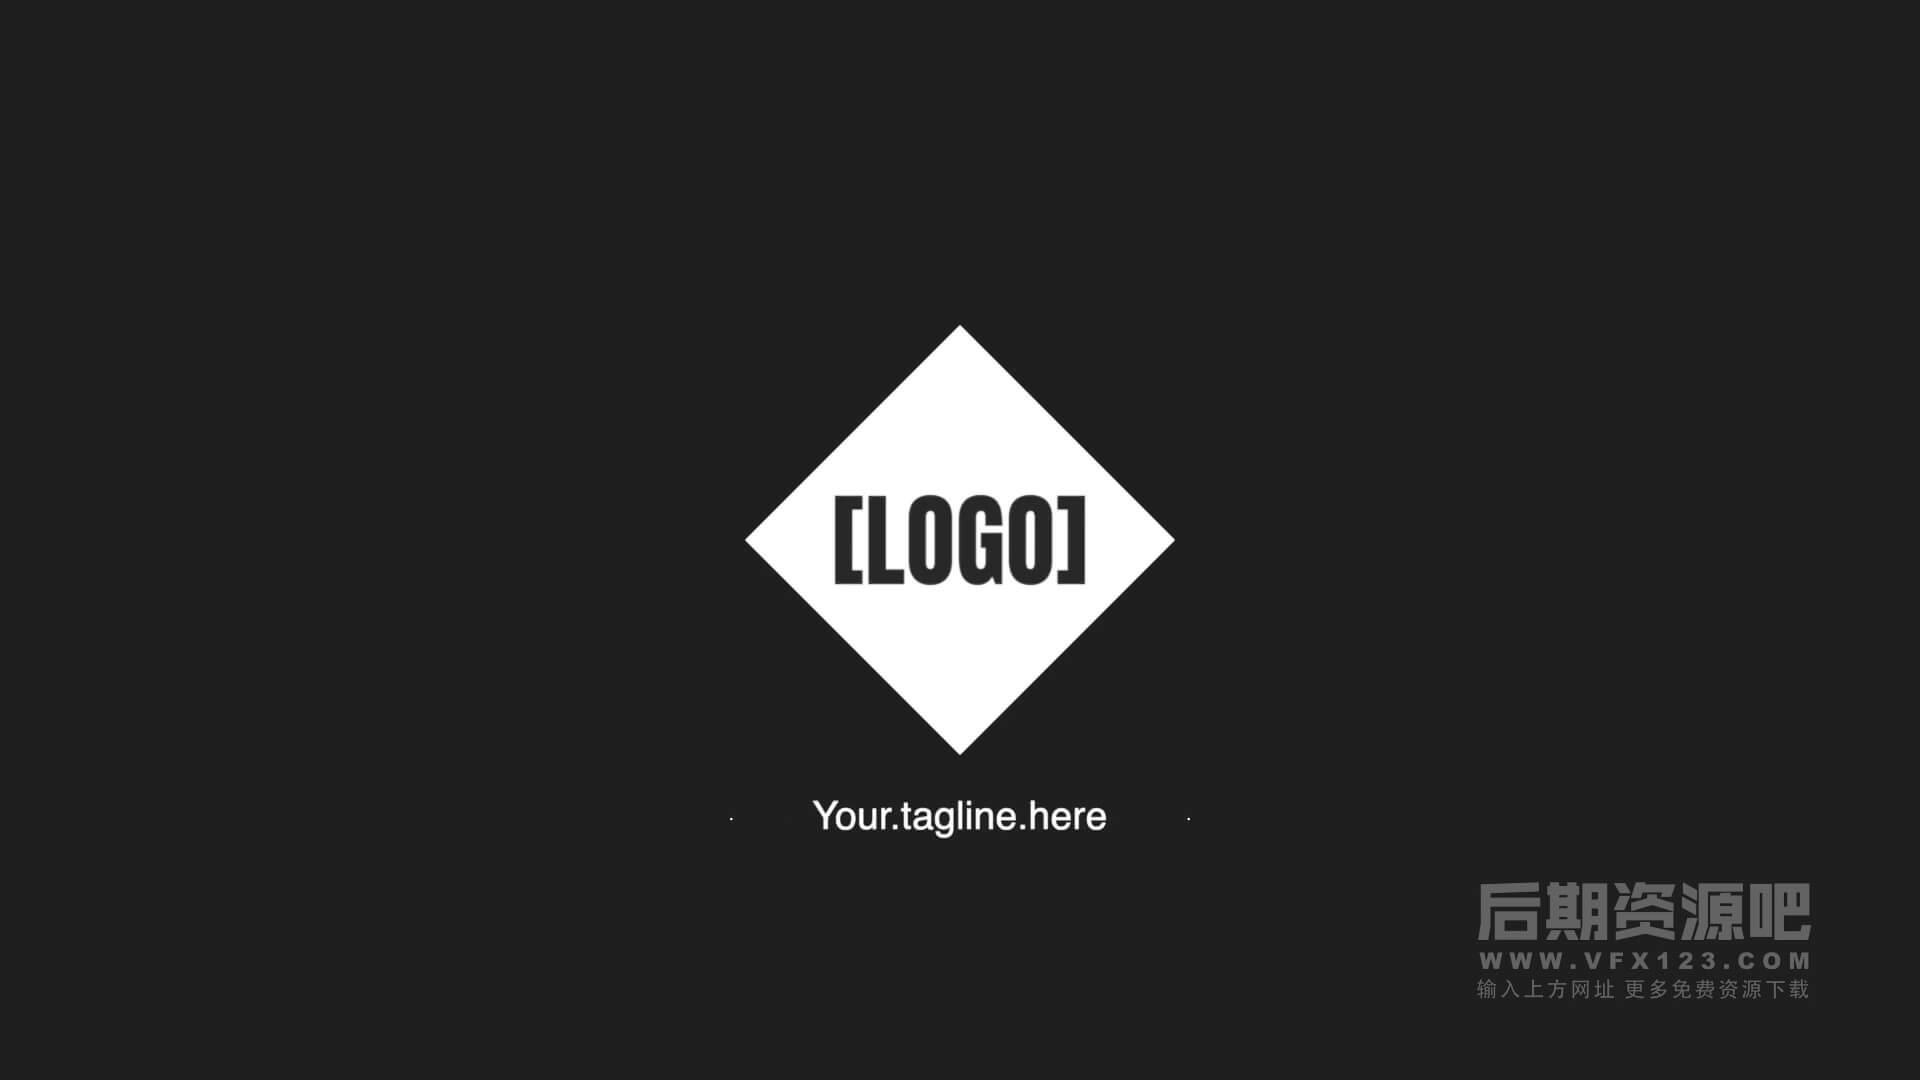 fcpx主题模板 工作室干净简洁迷你LOGO徽标展示 Minimal Shape Logo